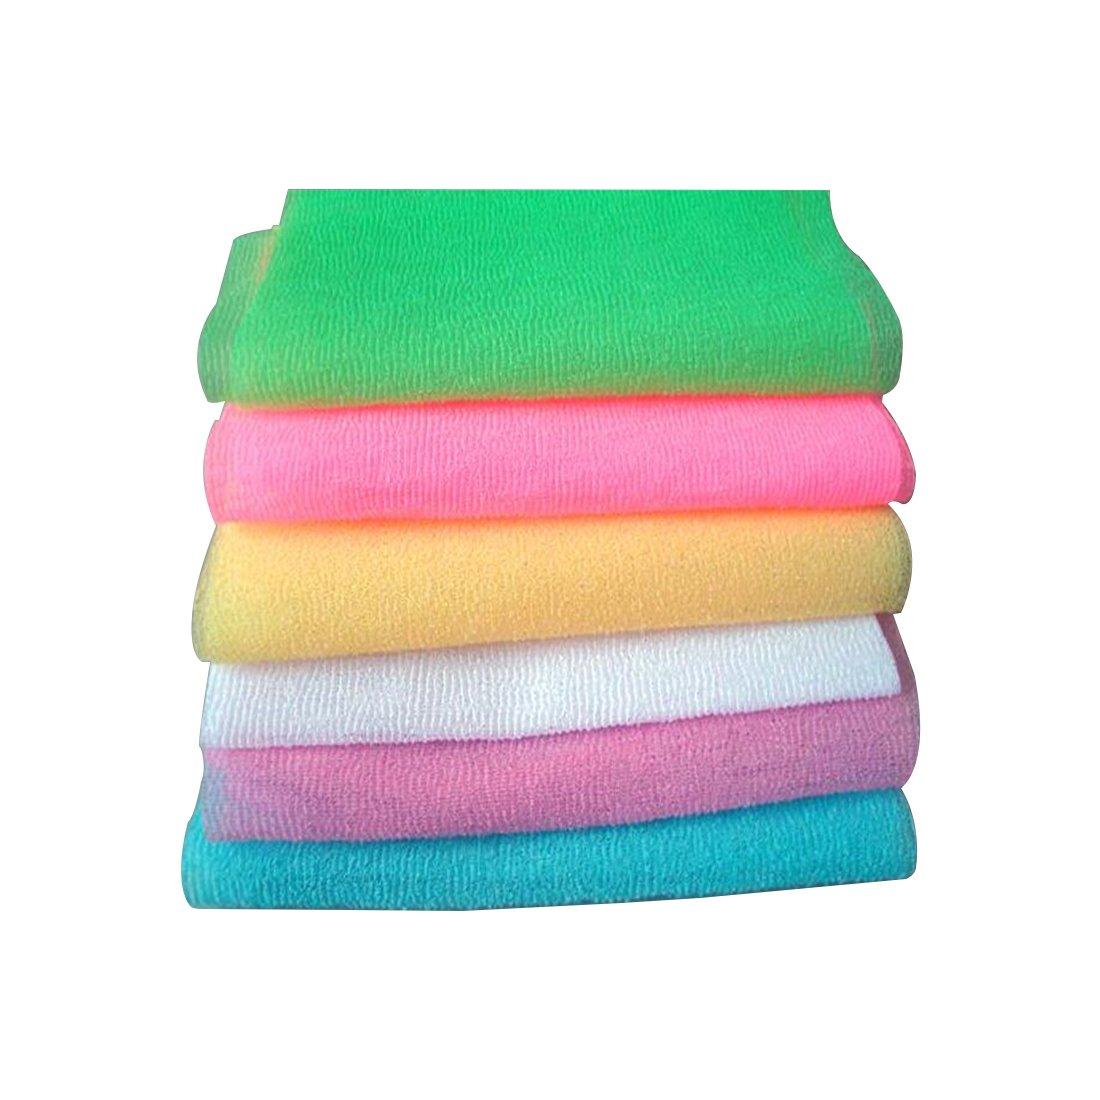 Bath Shower Nylon Scrubbing Towel Skin Cleaning Exfoliating Sponges